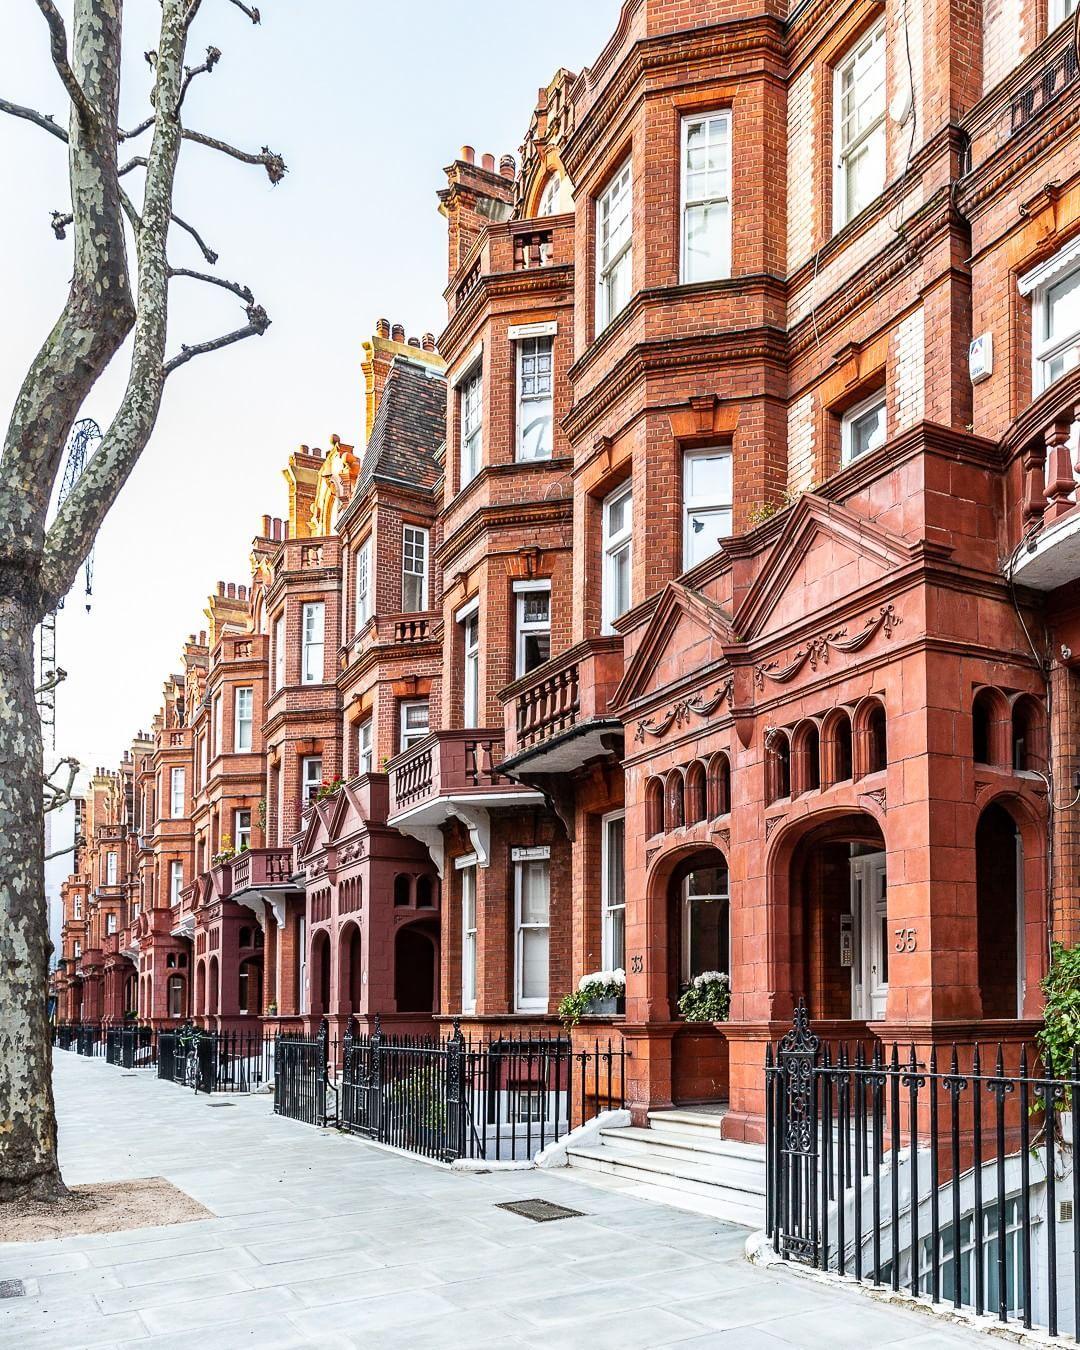 A Beautiful Row Of Brick Houses Near Sloane Square In Chelsea London Houses London Chelsea Sloanesquare Kensington And Chelsea London Chelsea London